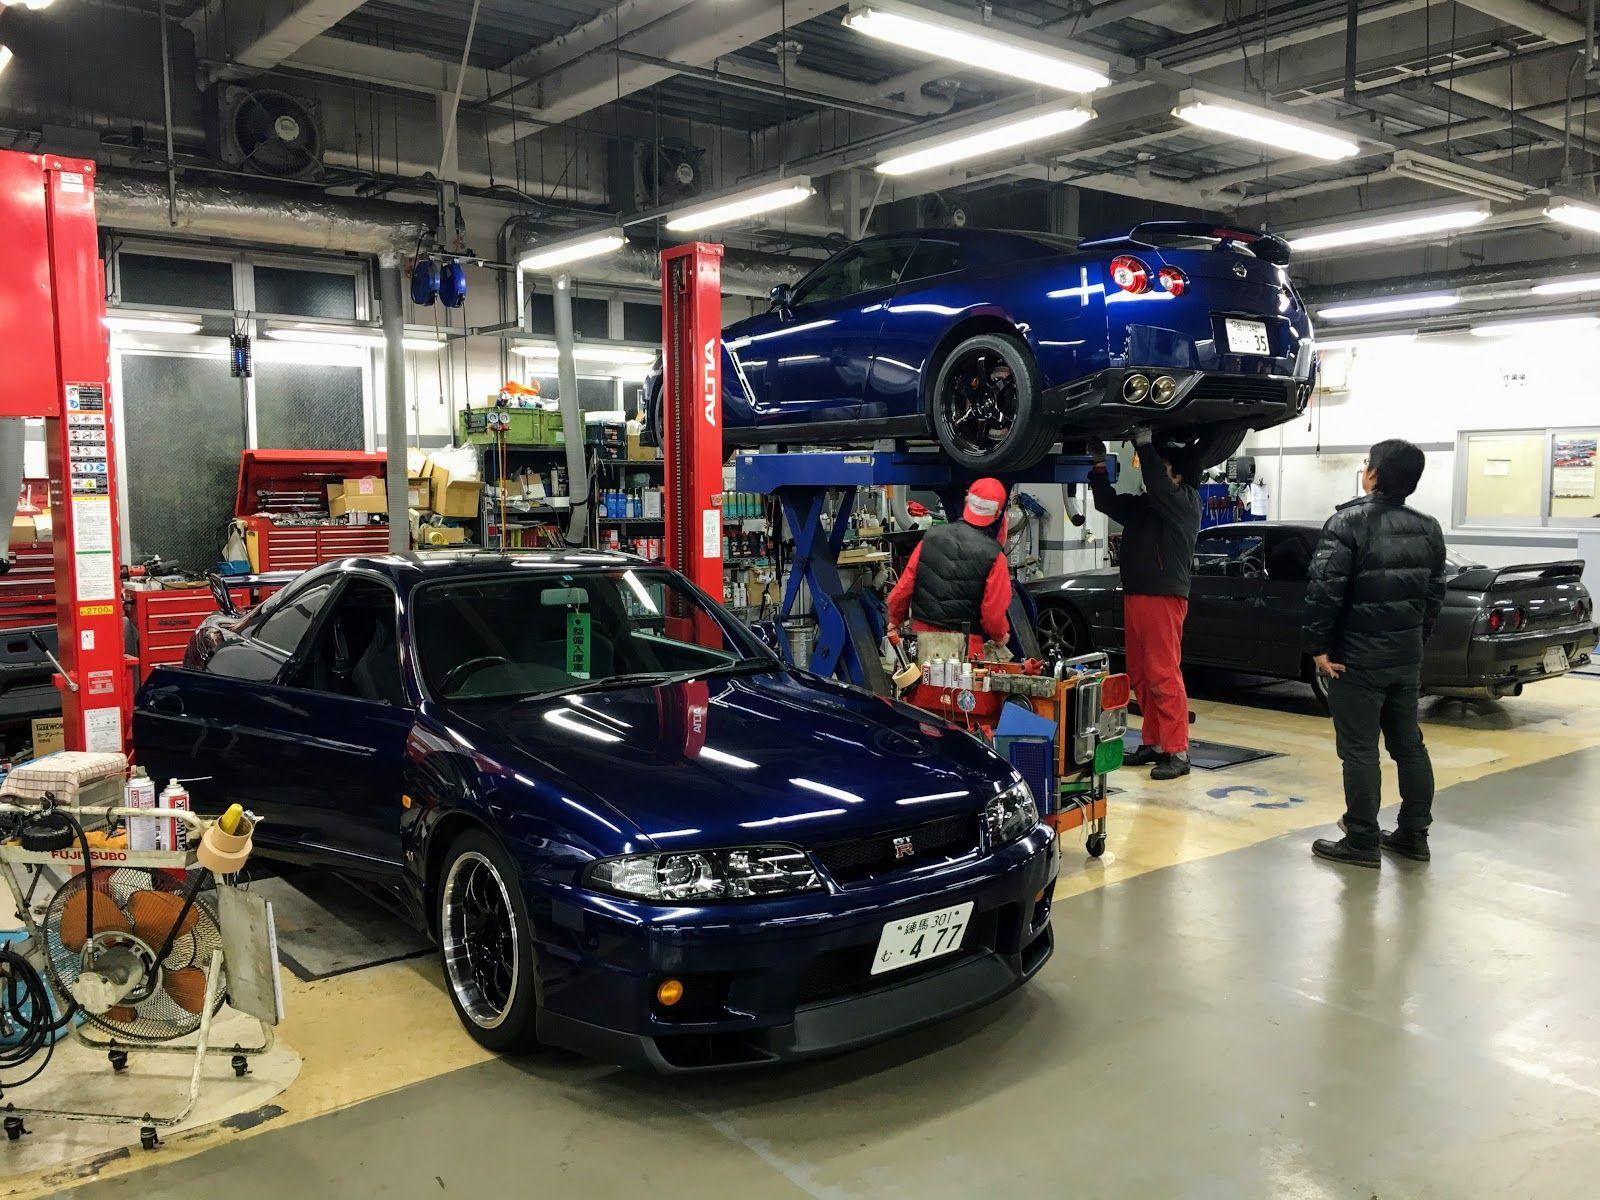 Bnr34 Workshop Bnr34 Gt R Visit To Npct New Parts And Nissan Fast Nissan Nissan Skyline Garage Design Interior